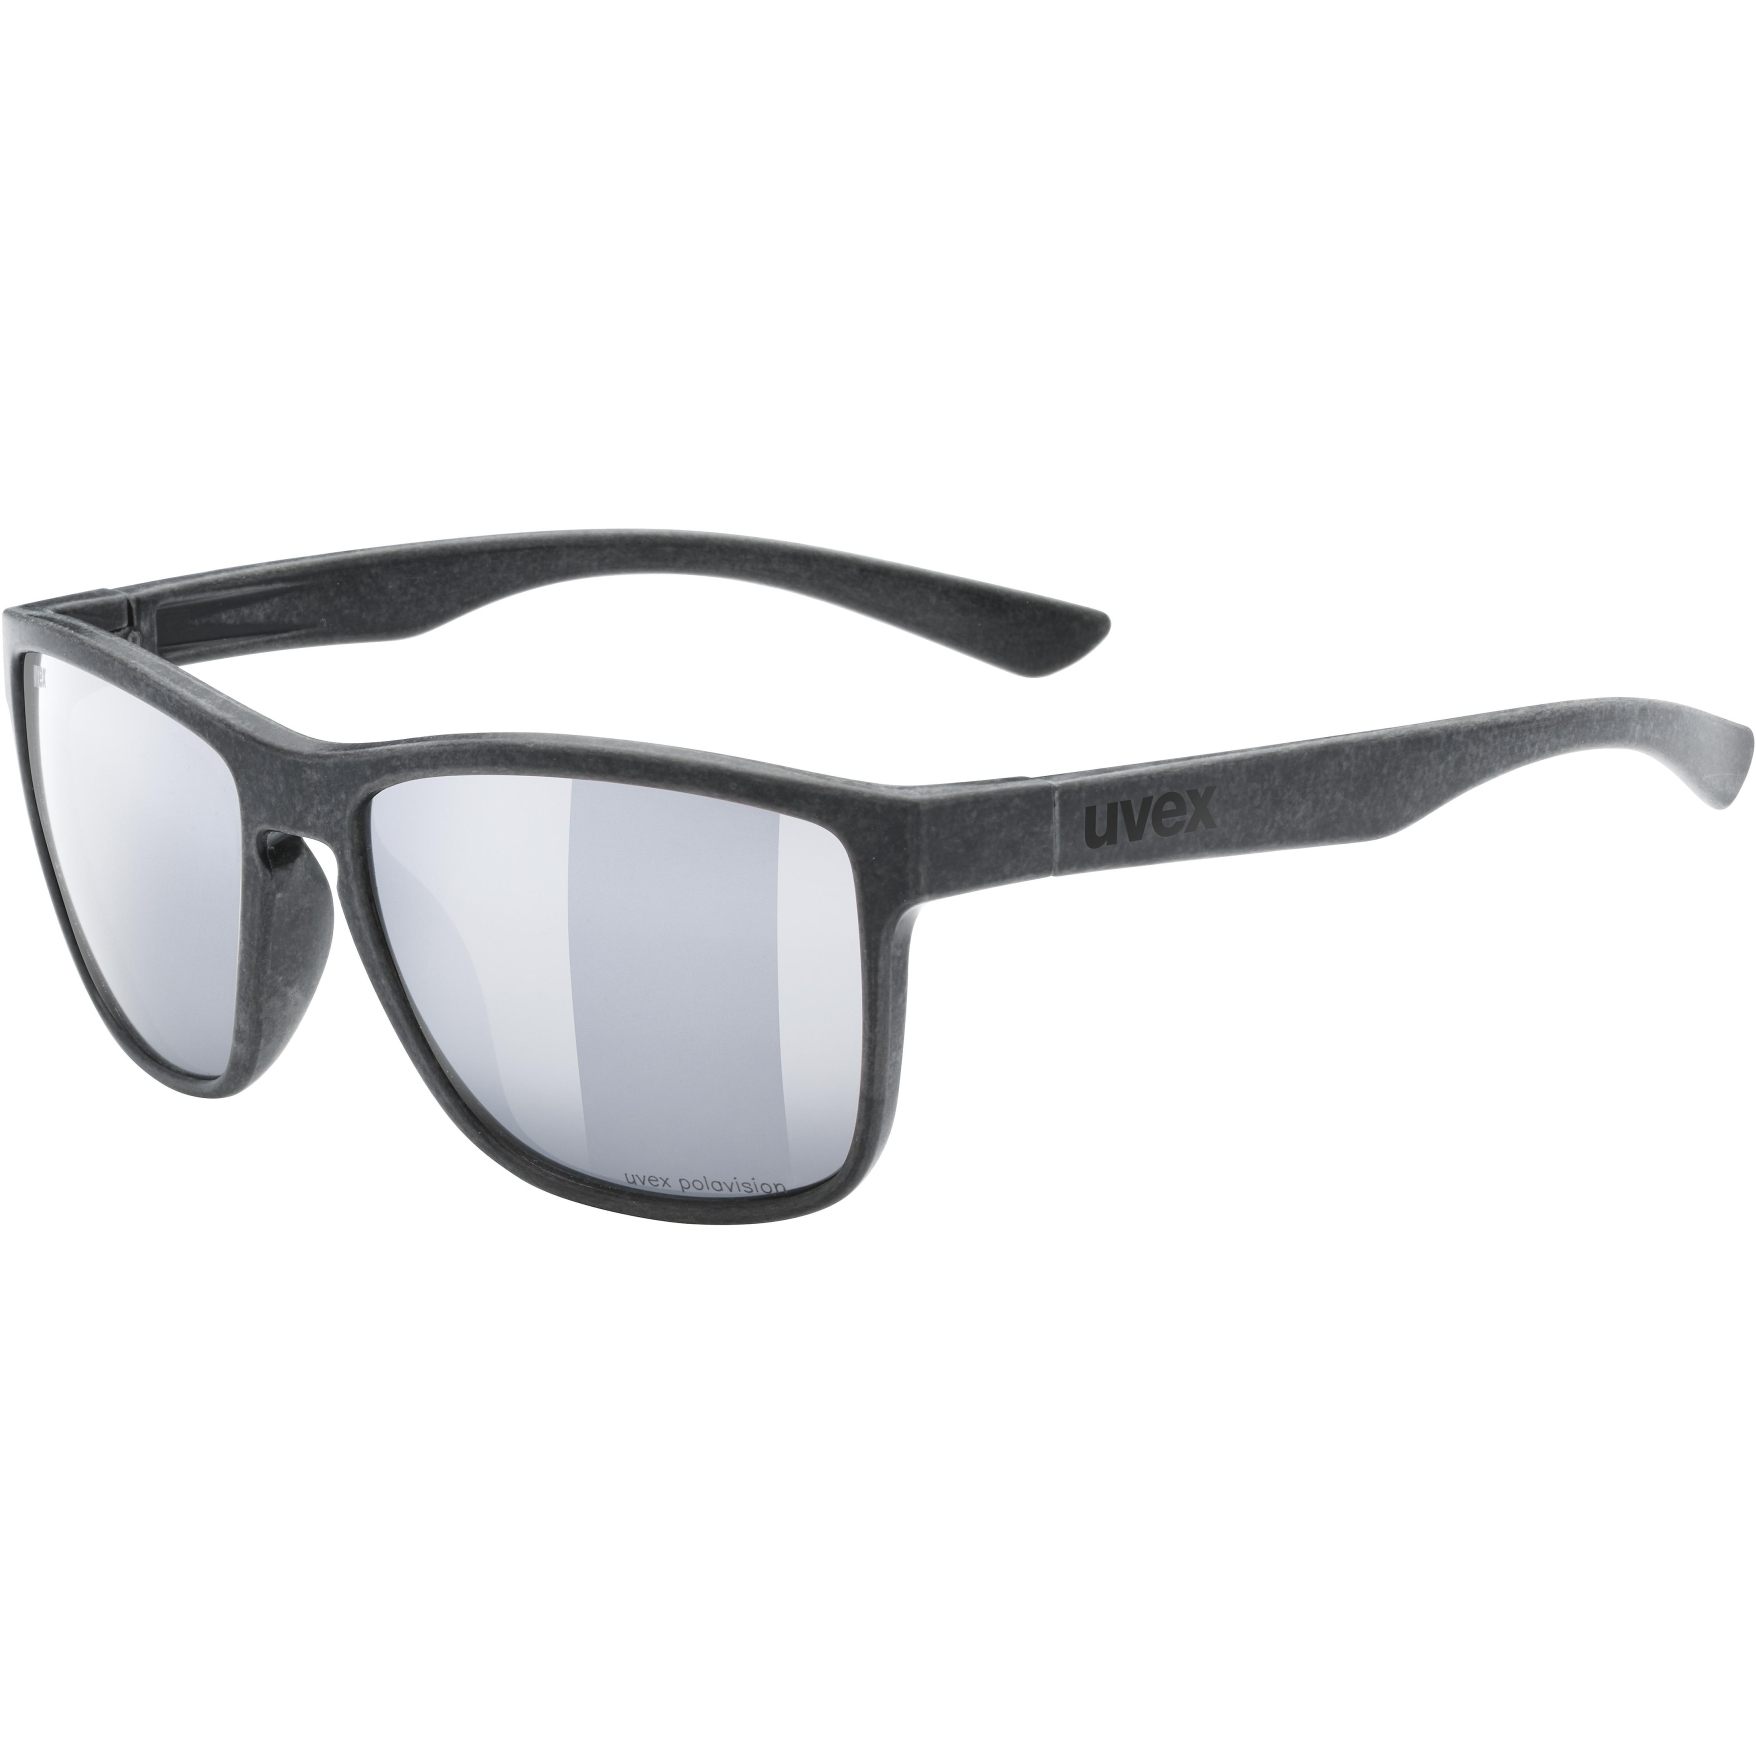 Uvex lgl ocean 2 P Brille - black mat/polavision mirror silver